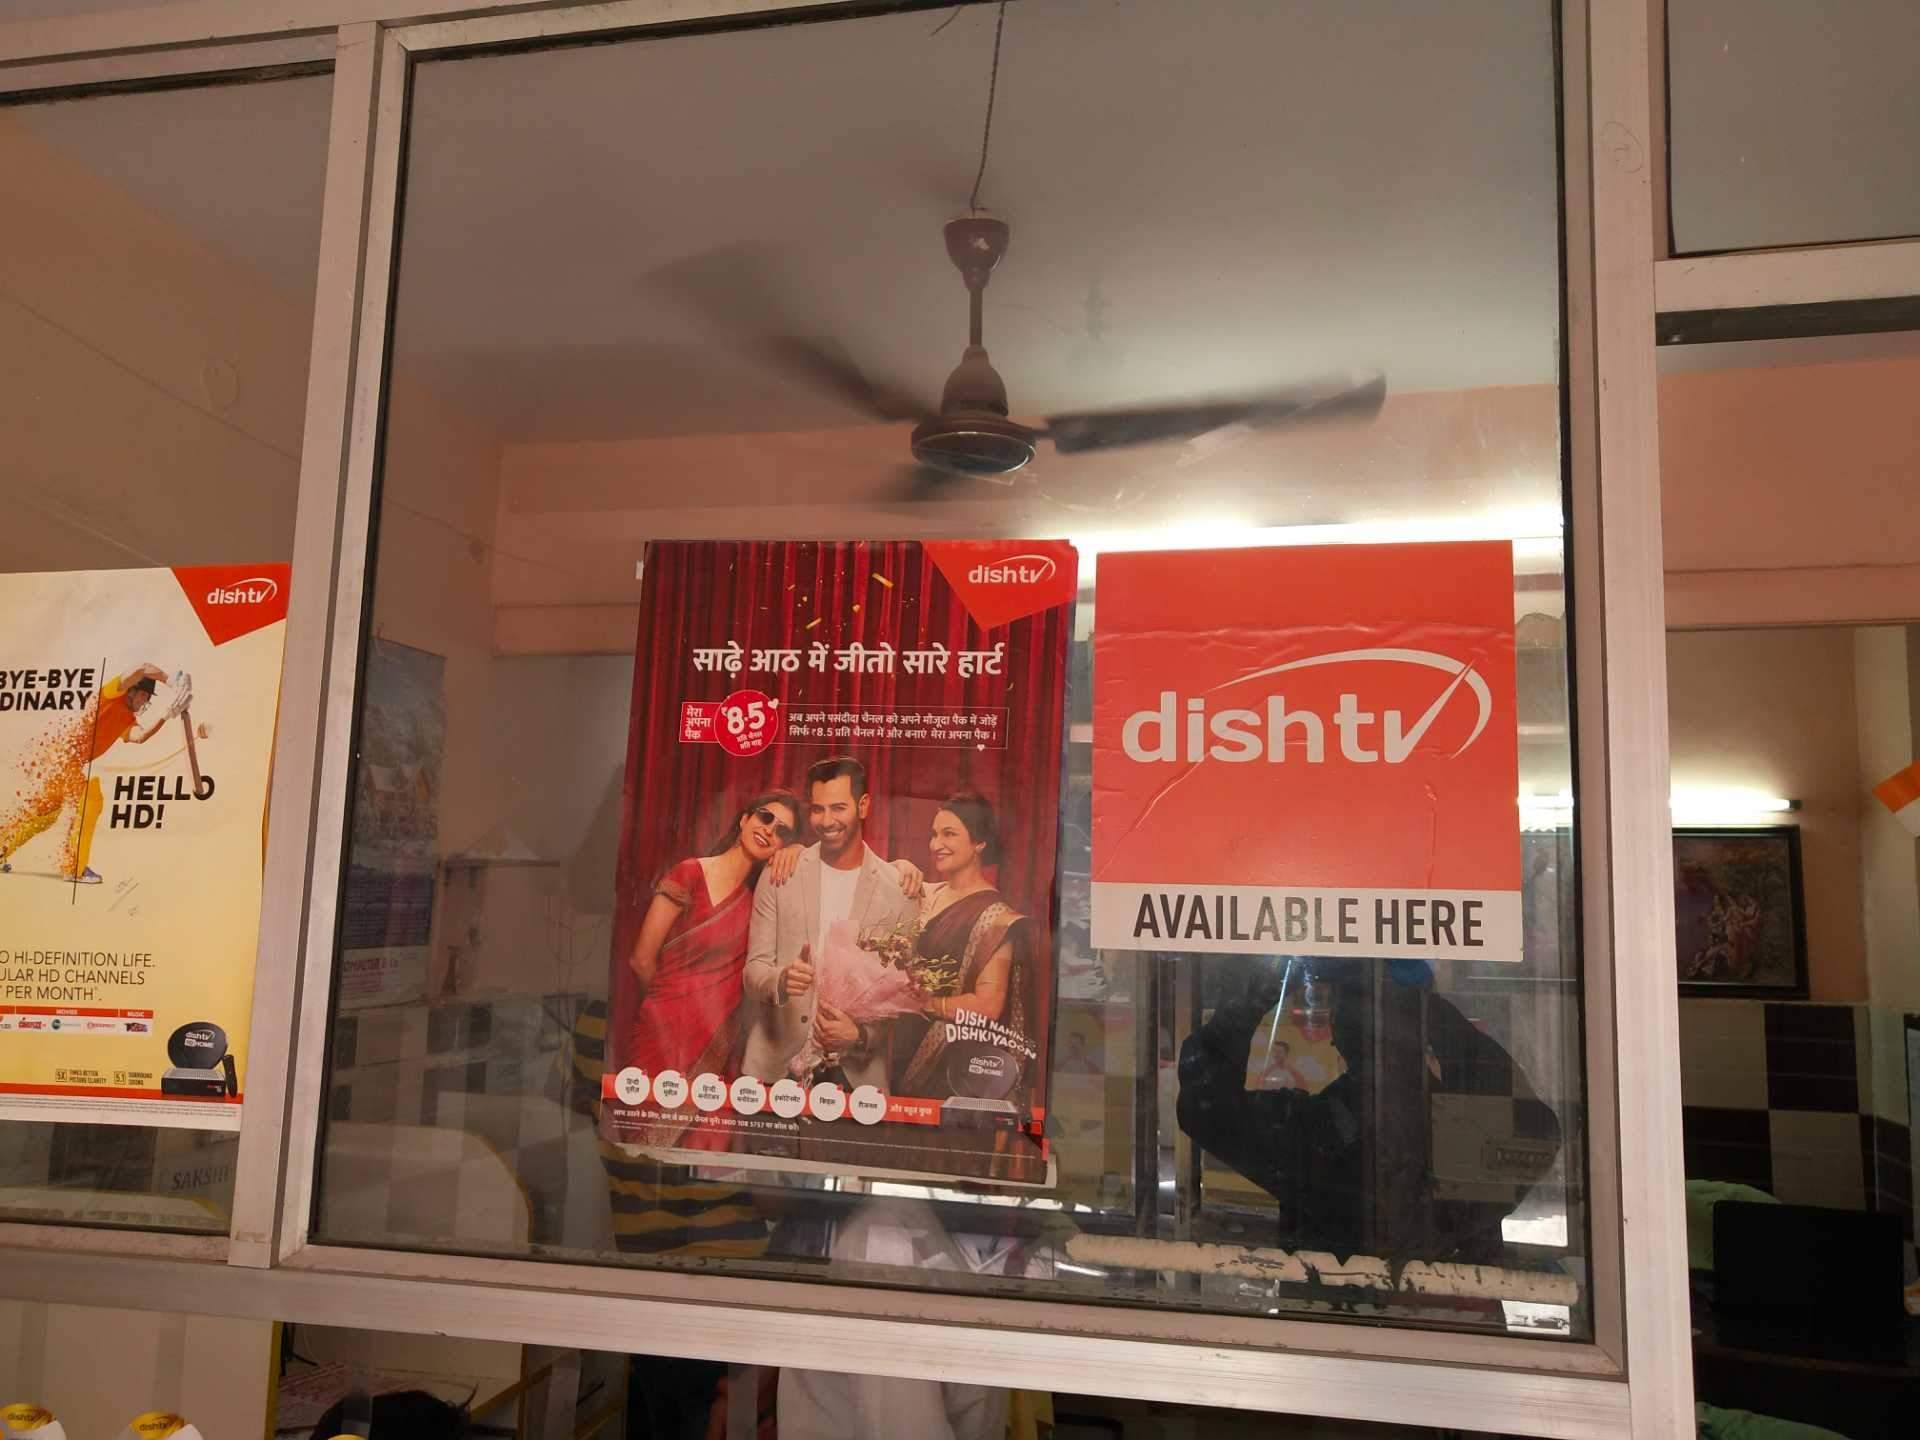 Top Dish Tv Dth Antenna Distributors in Chandigarh Sector 18 - Best